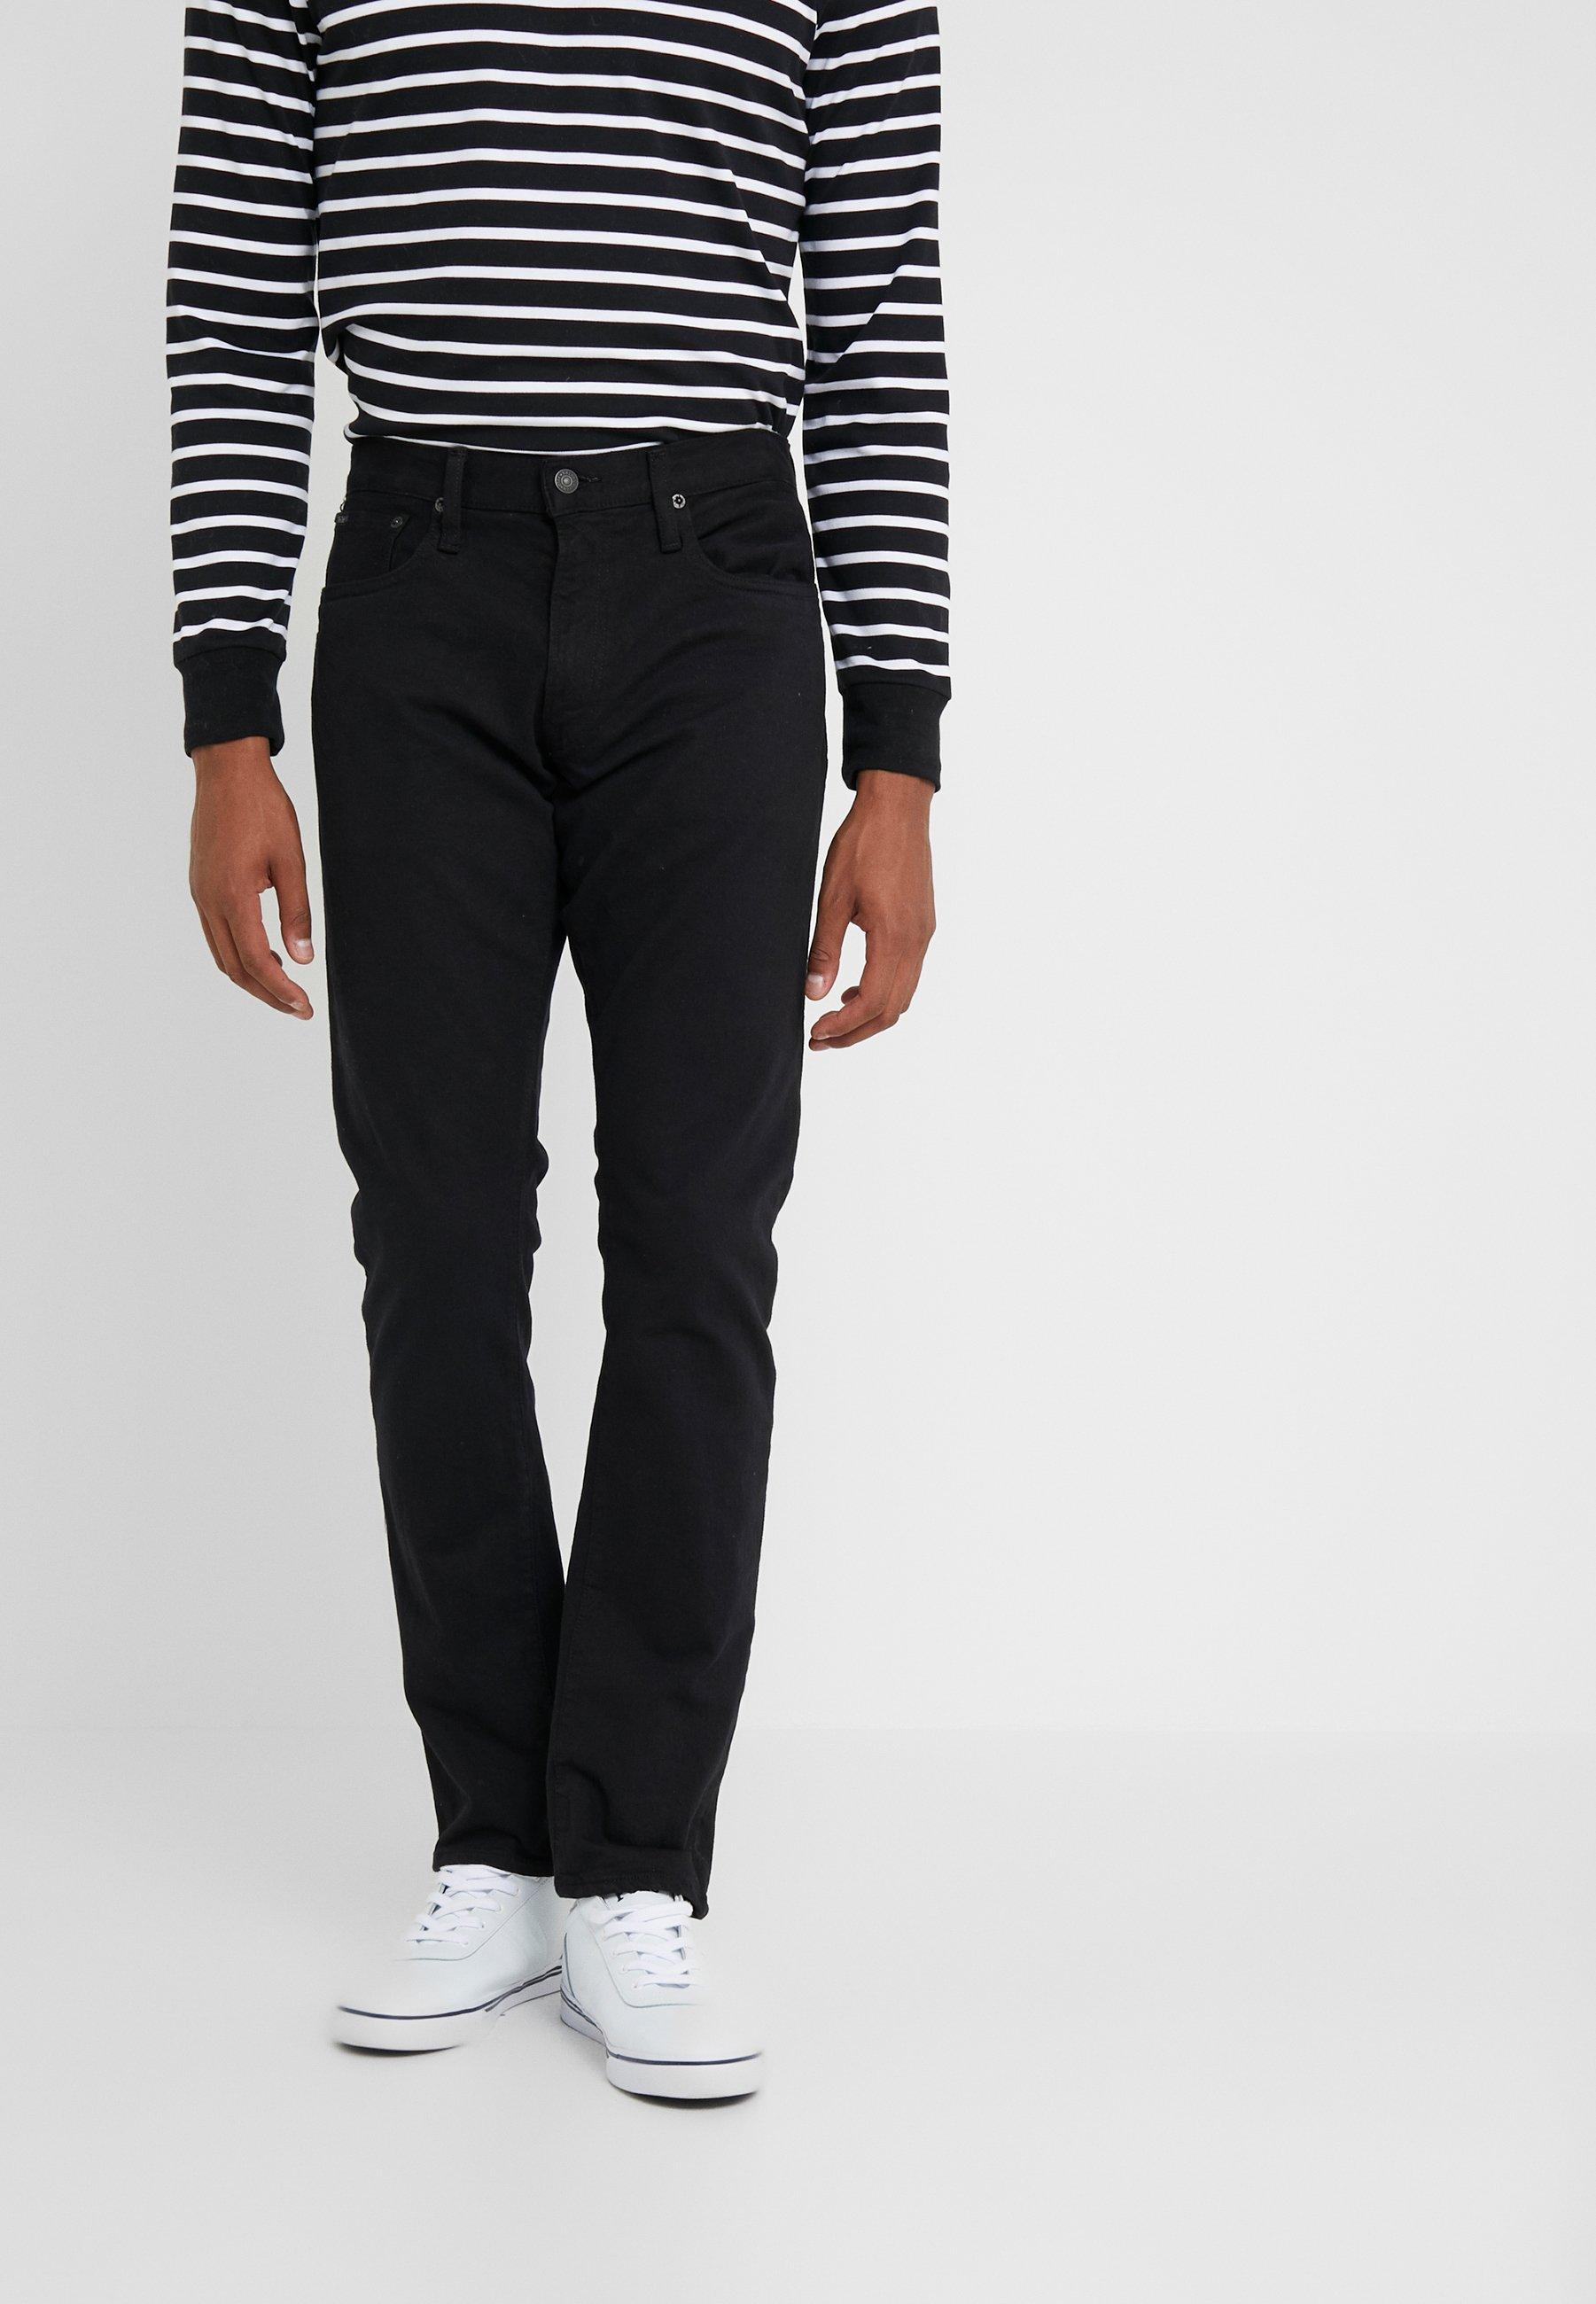 Uomo SULLIVAN SLIM - Jeans slim fit